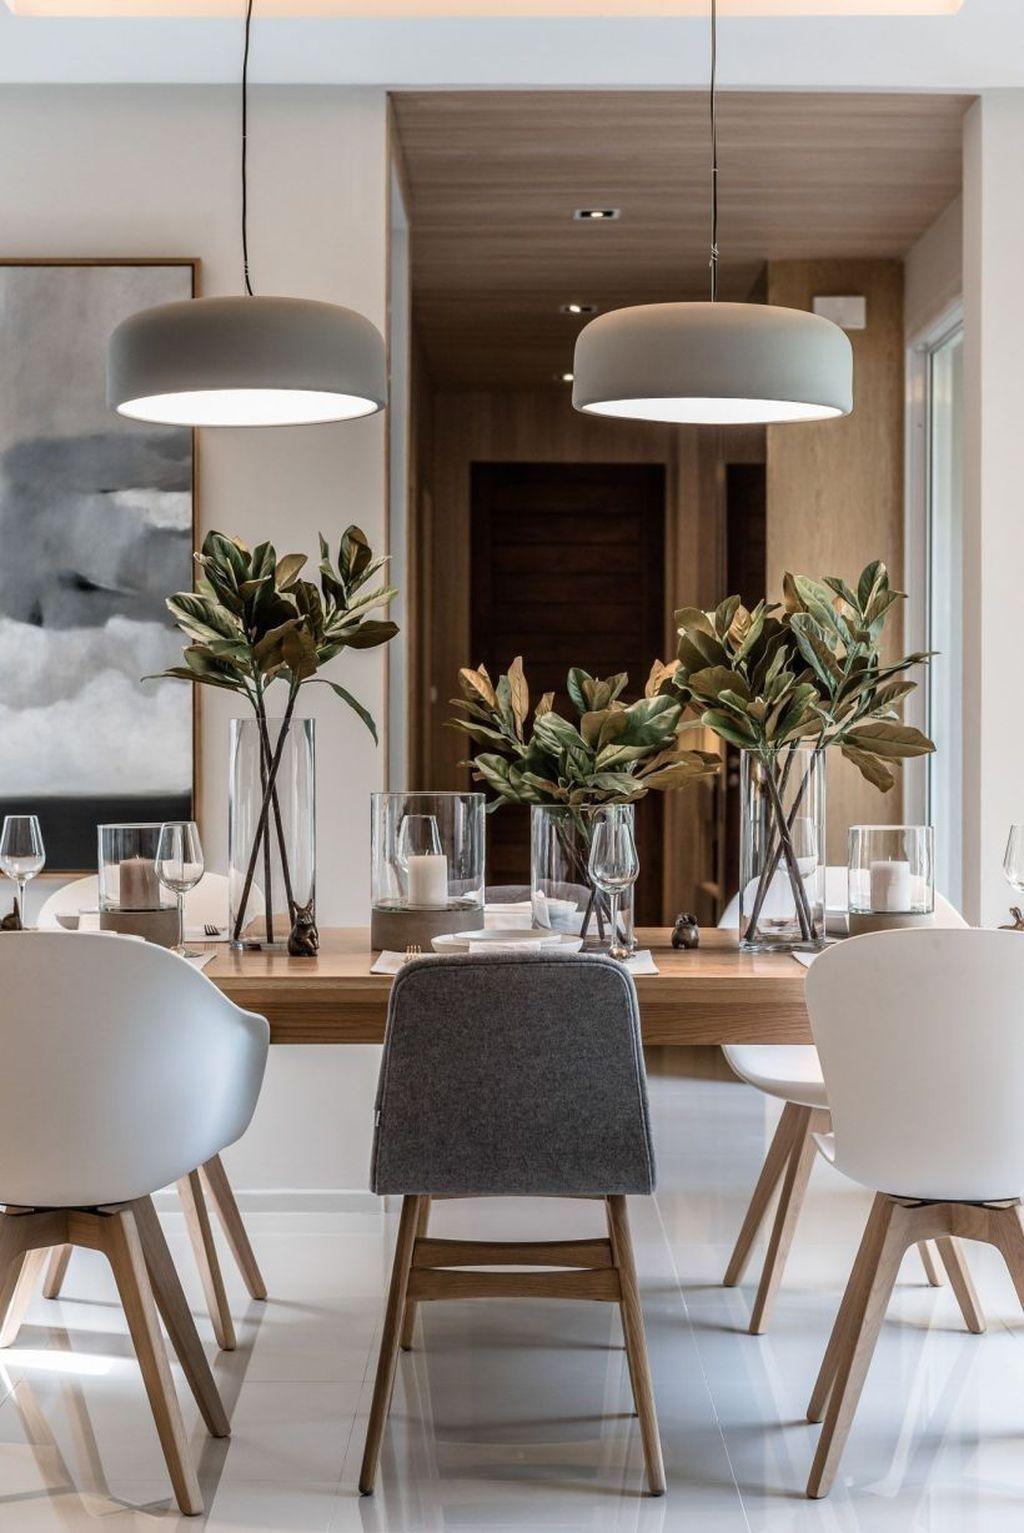 Elegant Modern Dining Table Design Ideas 47 Dining Room Design Dining Room Design Modern Modern Dining Room